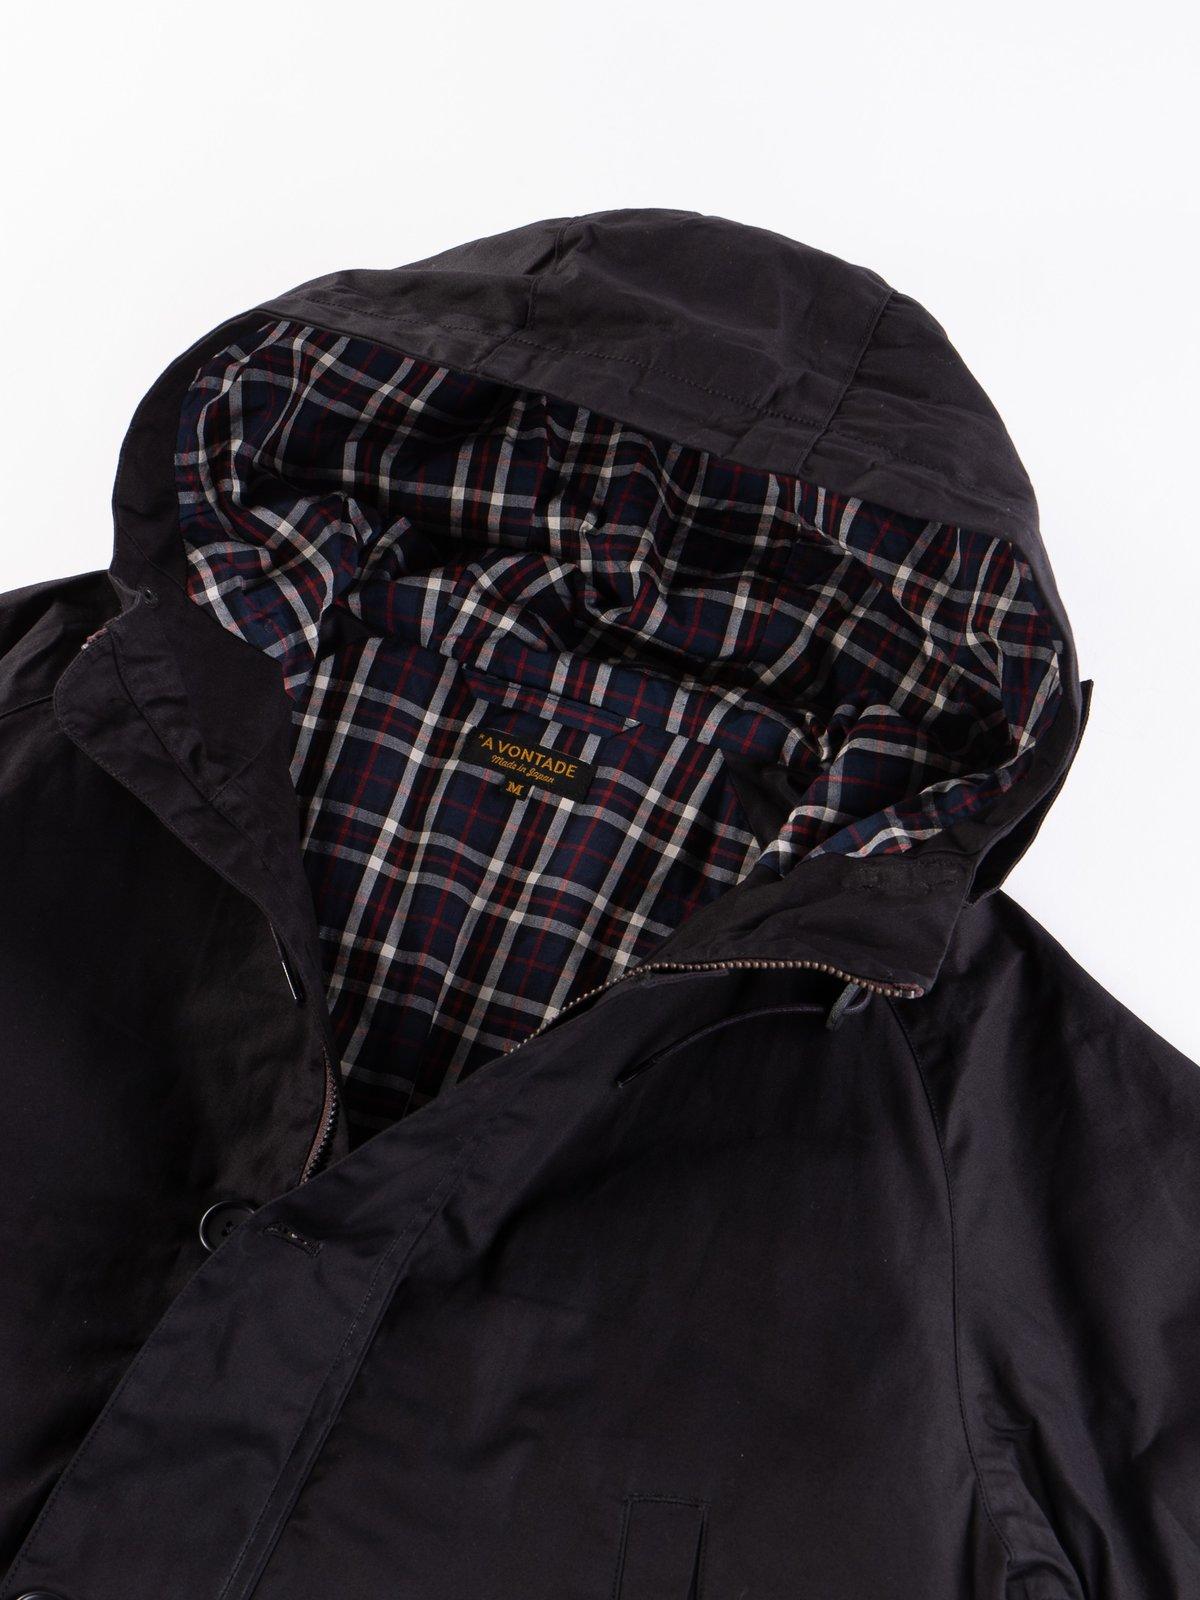 Black British Field Hooded Jacket - Image 4